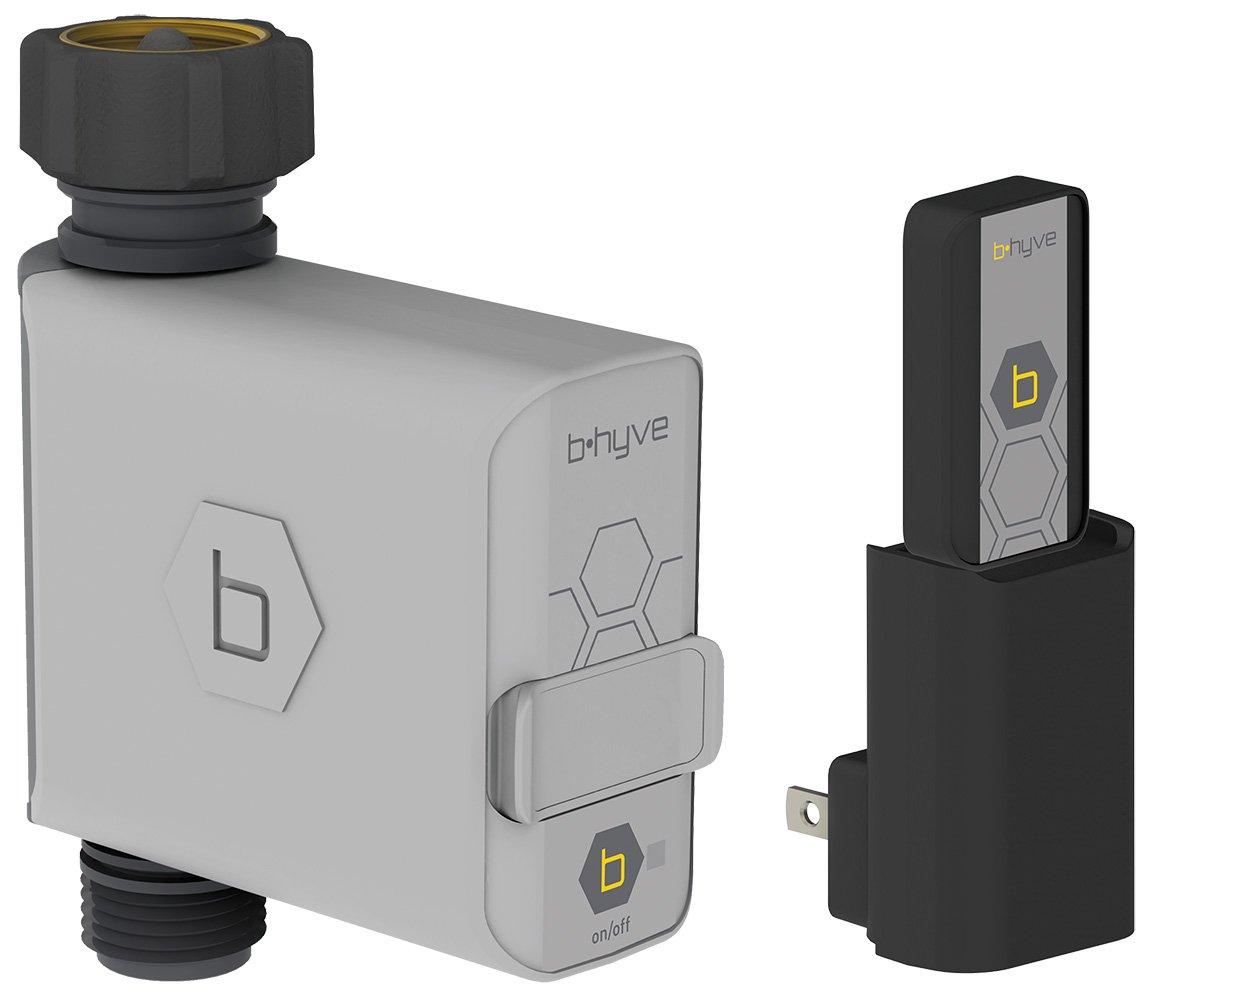 Orbit B-hyve 21004 Smart Hose Faucet Timer Wi-Fi Hub, Compatible Alexa